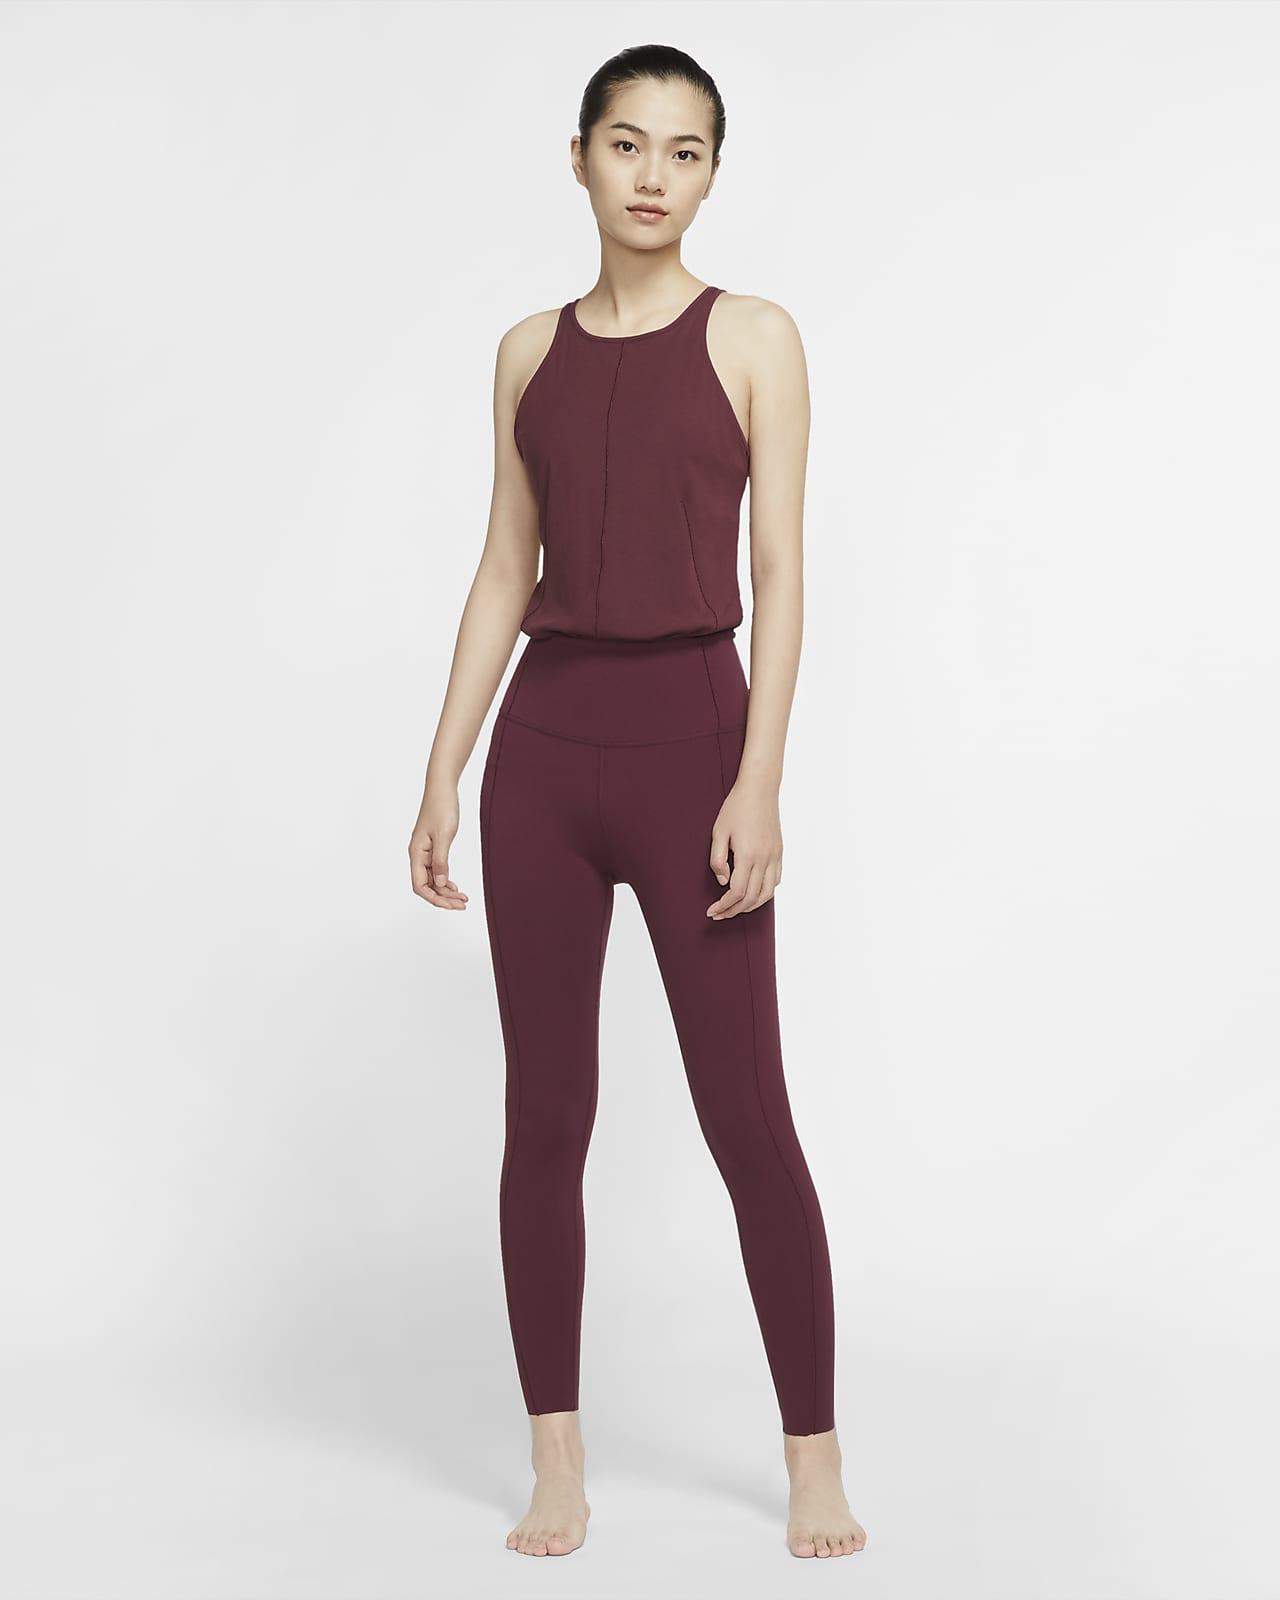 Nike Yoga Women's Infinalon Jumpsuit